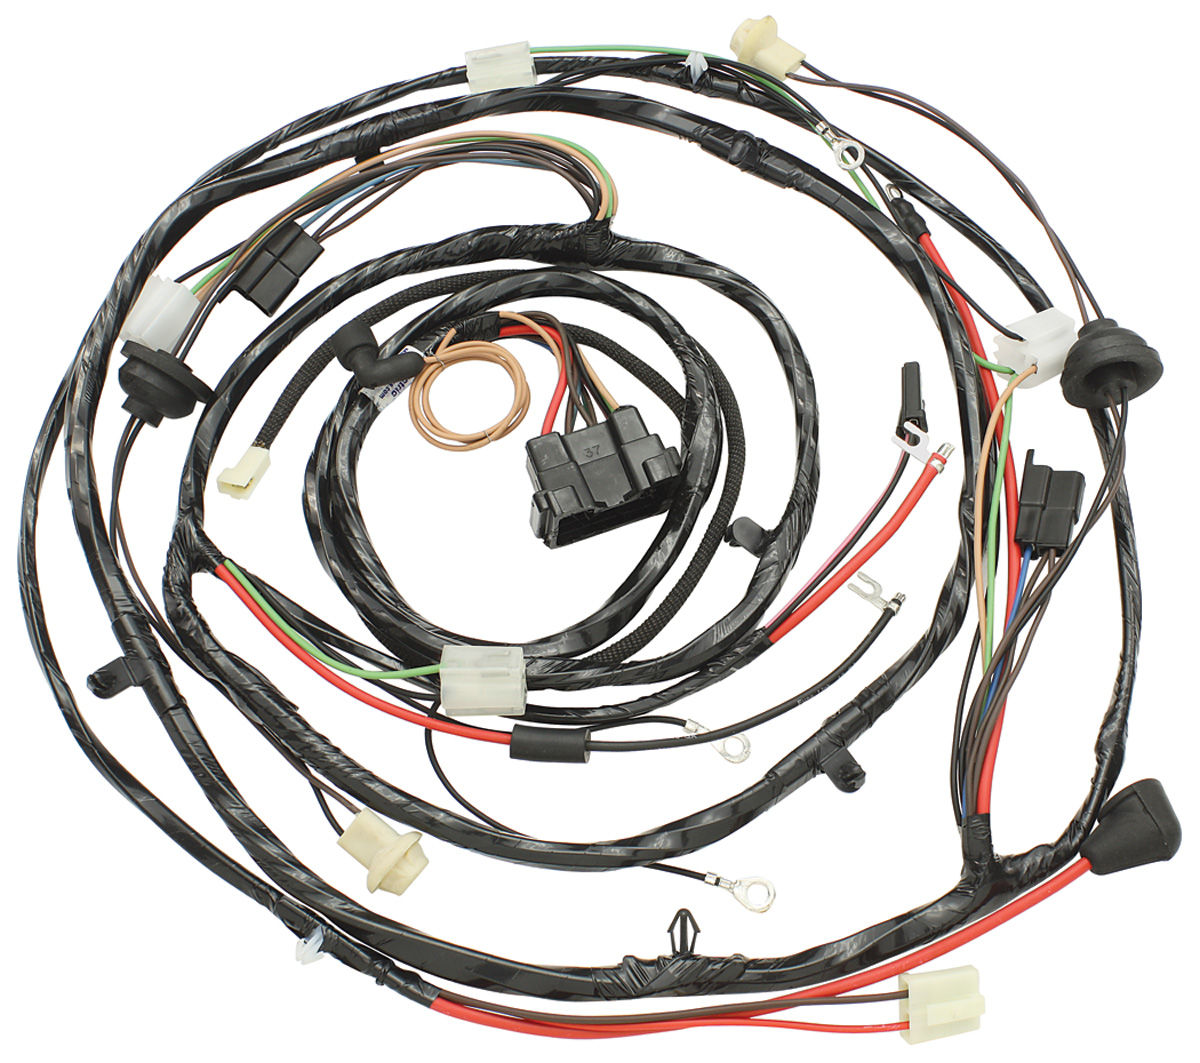 M U0026h 1970 Chevelle Forward Lamp Harness V8 W  Warning Lights  U0026 Ac  Alt   Pass    Int  Reg     Opgi Com